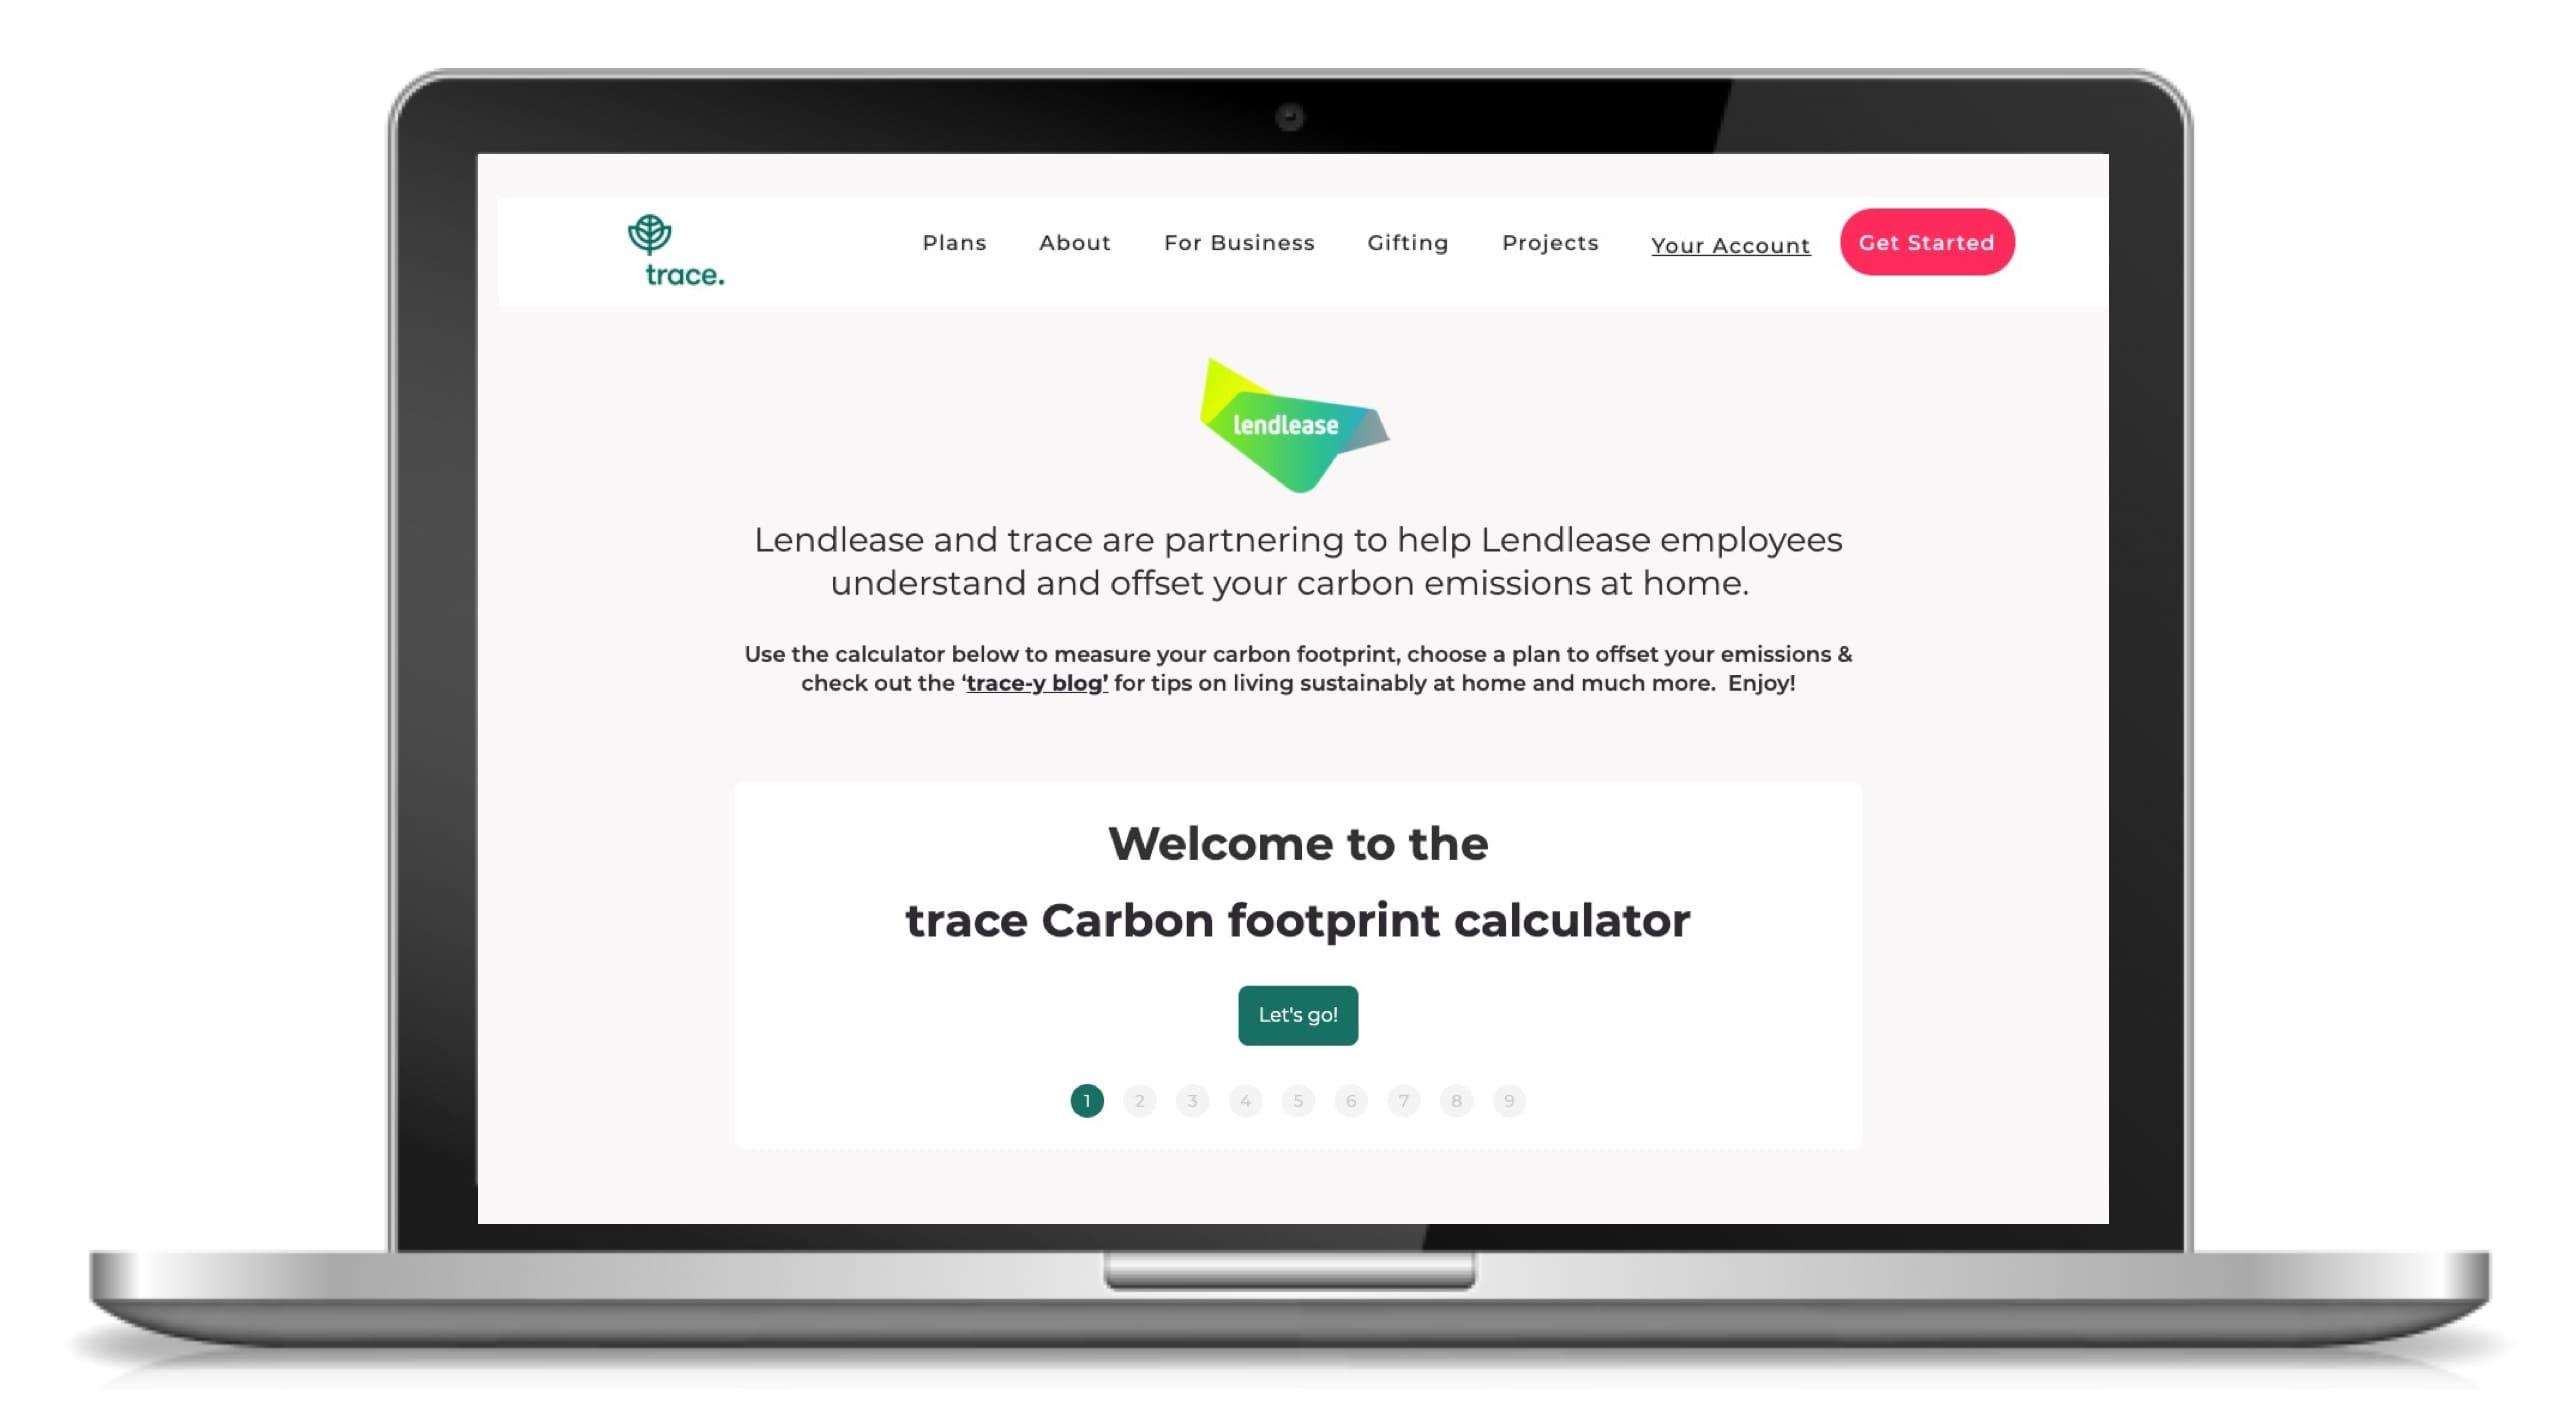 Lendlease carbon calculator landing page